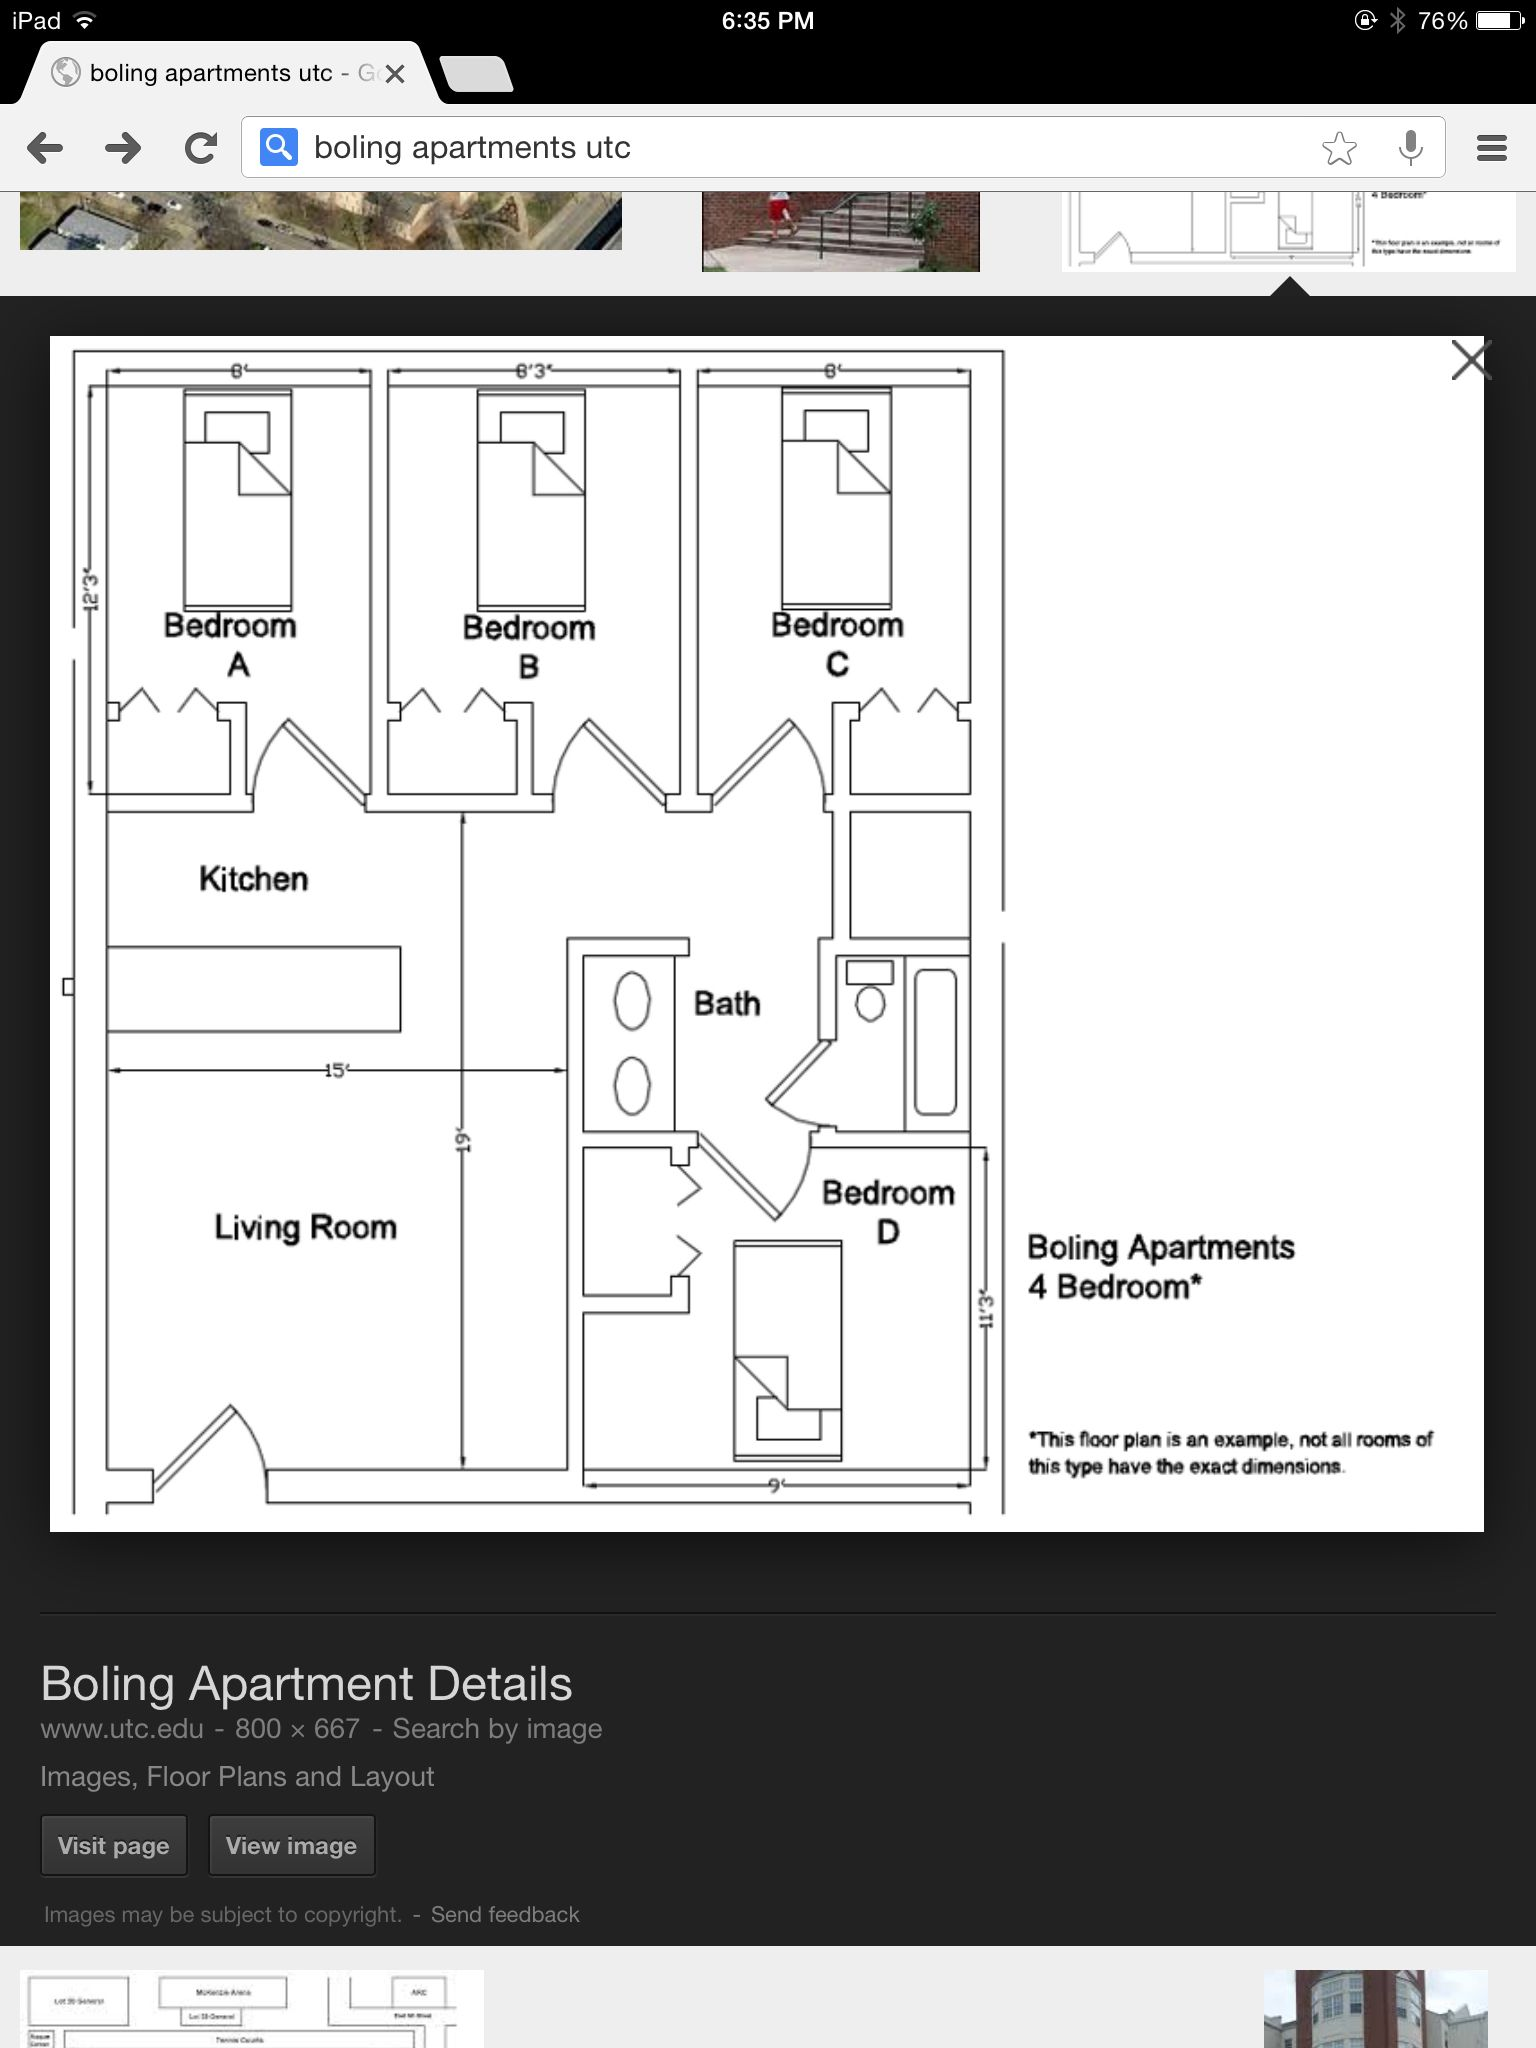 Boling Apartments Utc